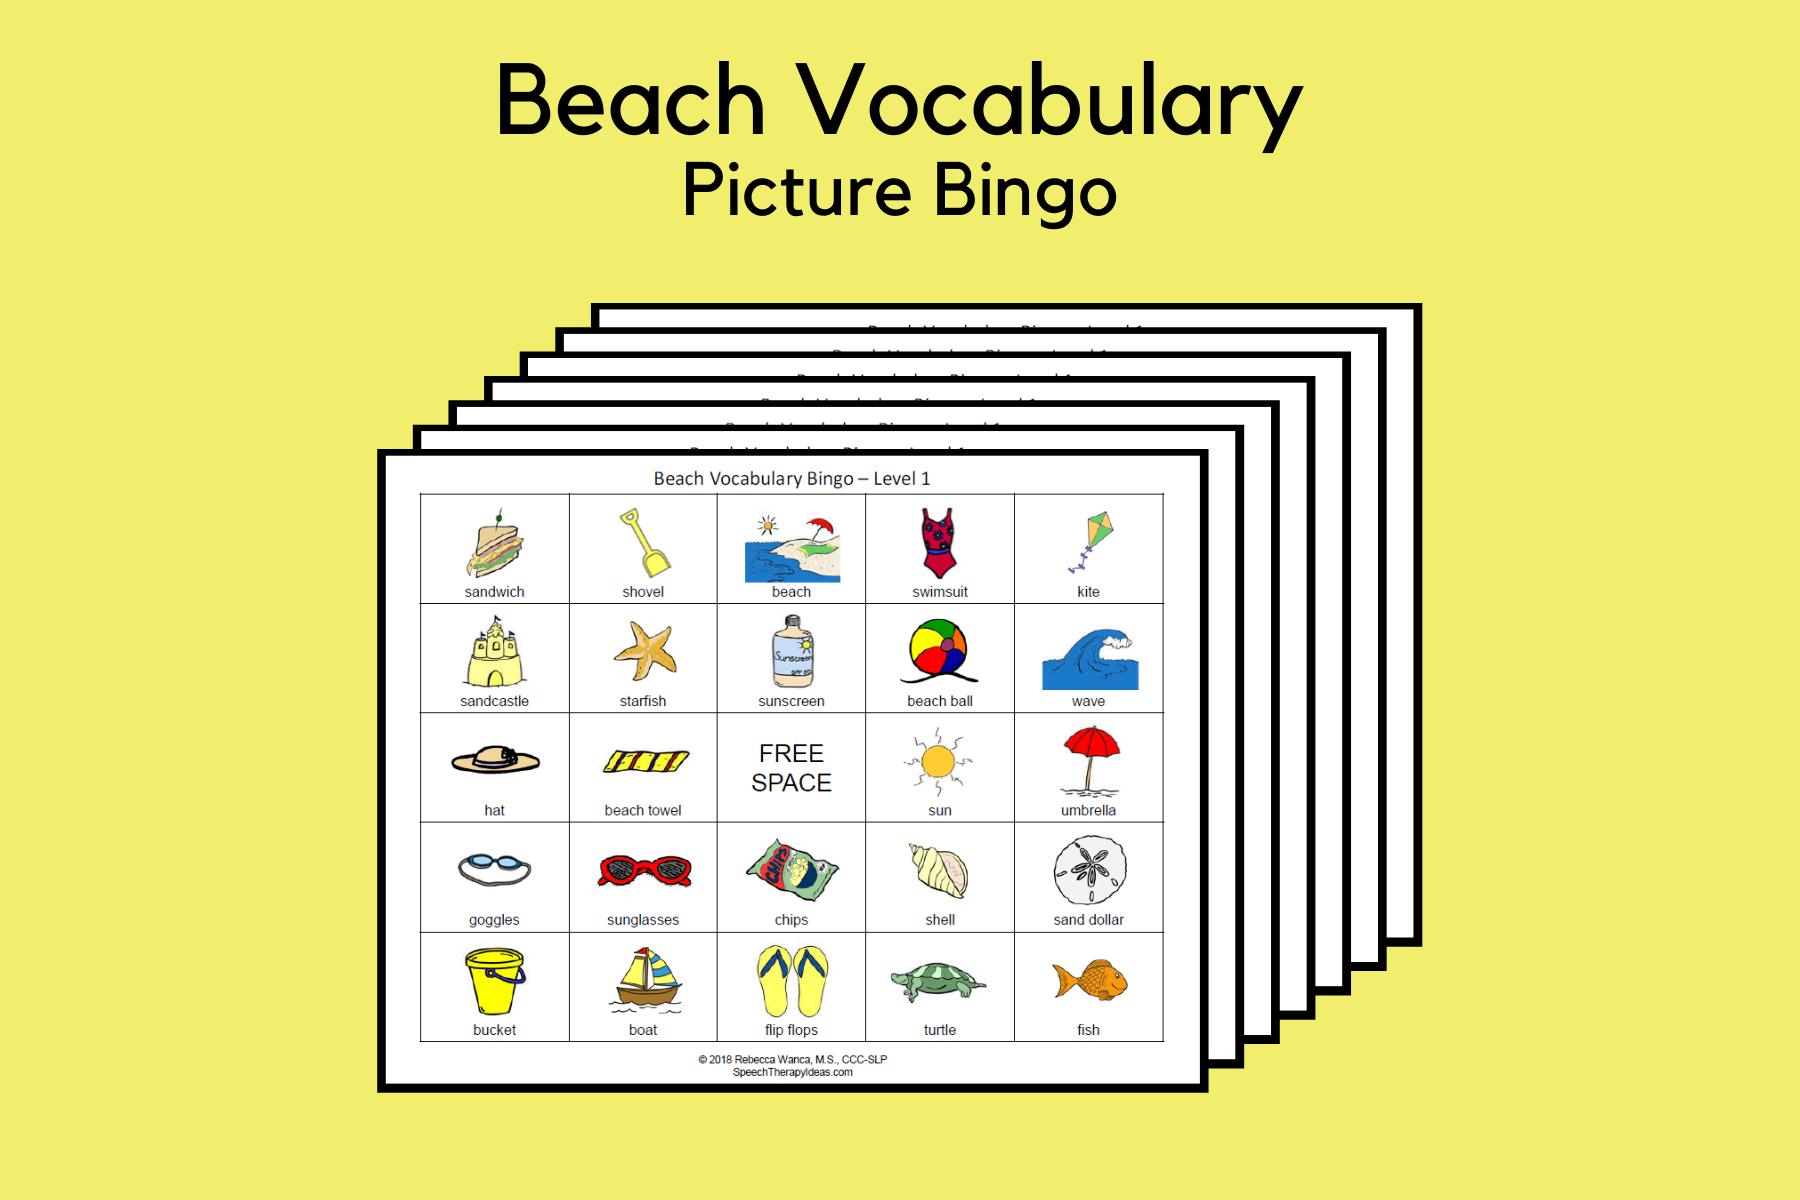 Beach Vocabulary Picture Bingo